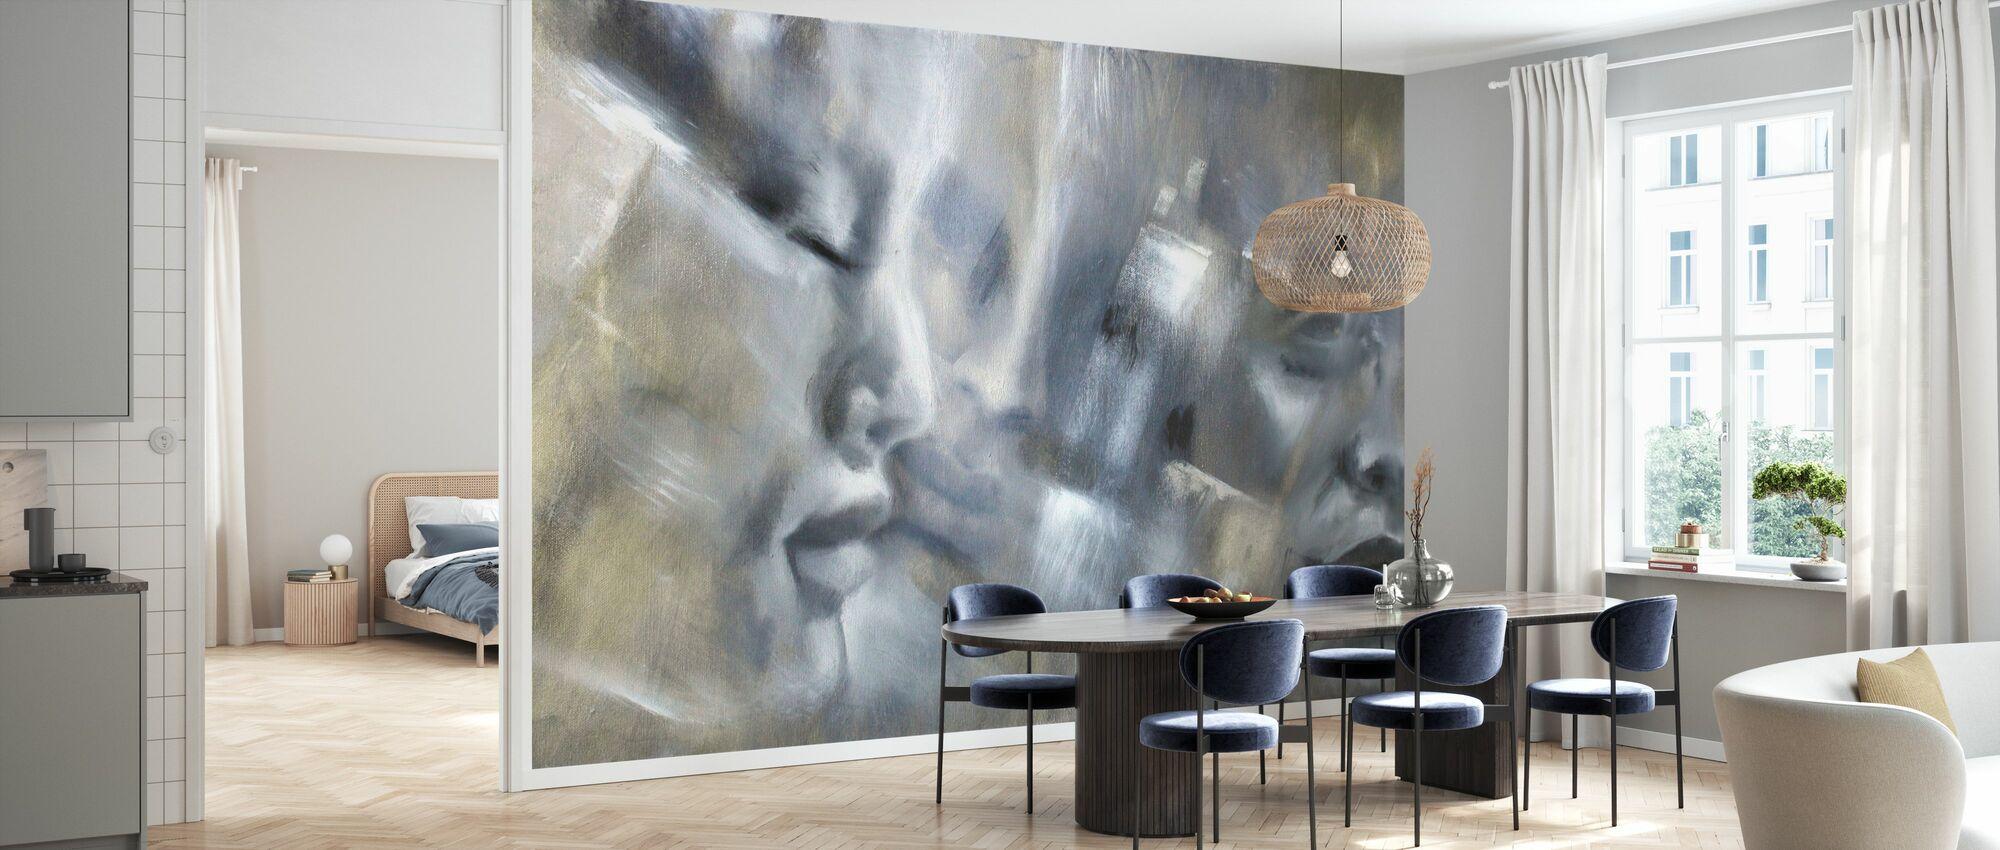 Faces - Wallpaper - Kitchen